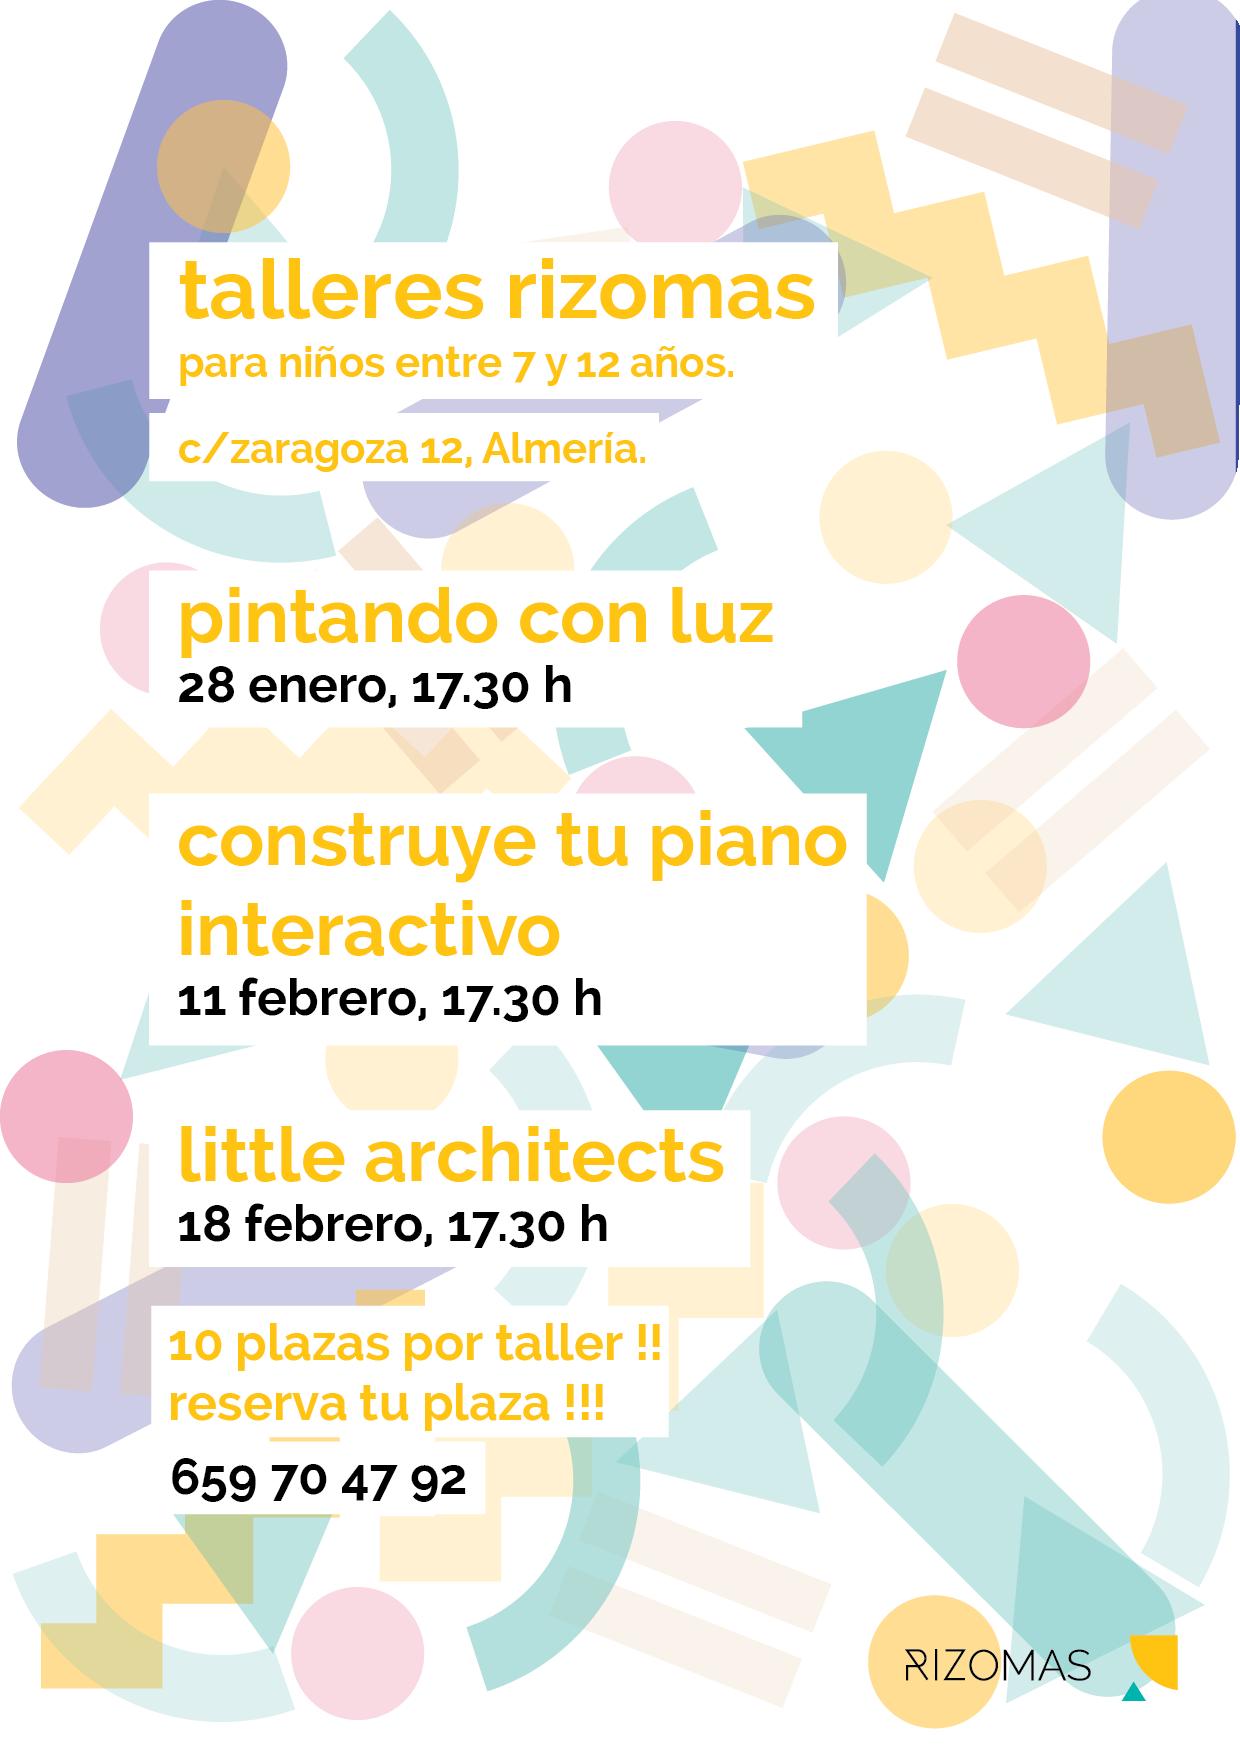 talleresRizomas